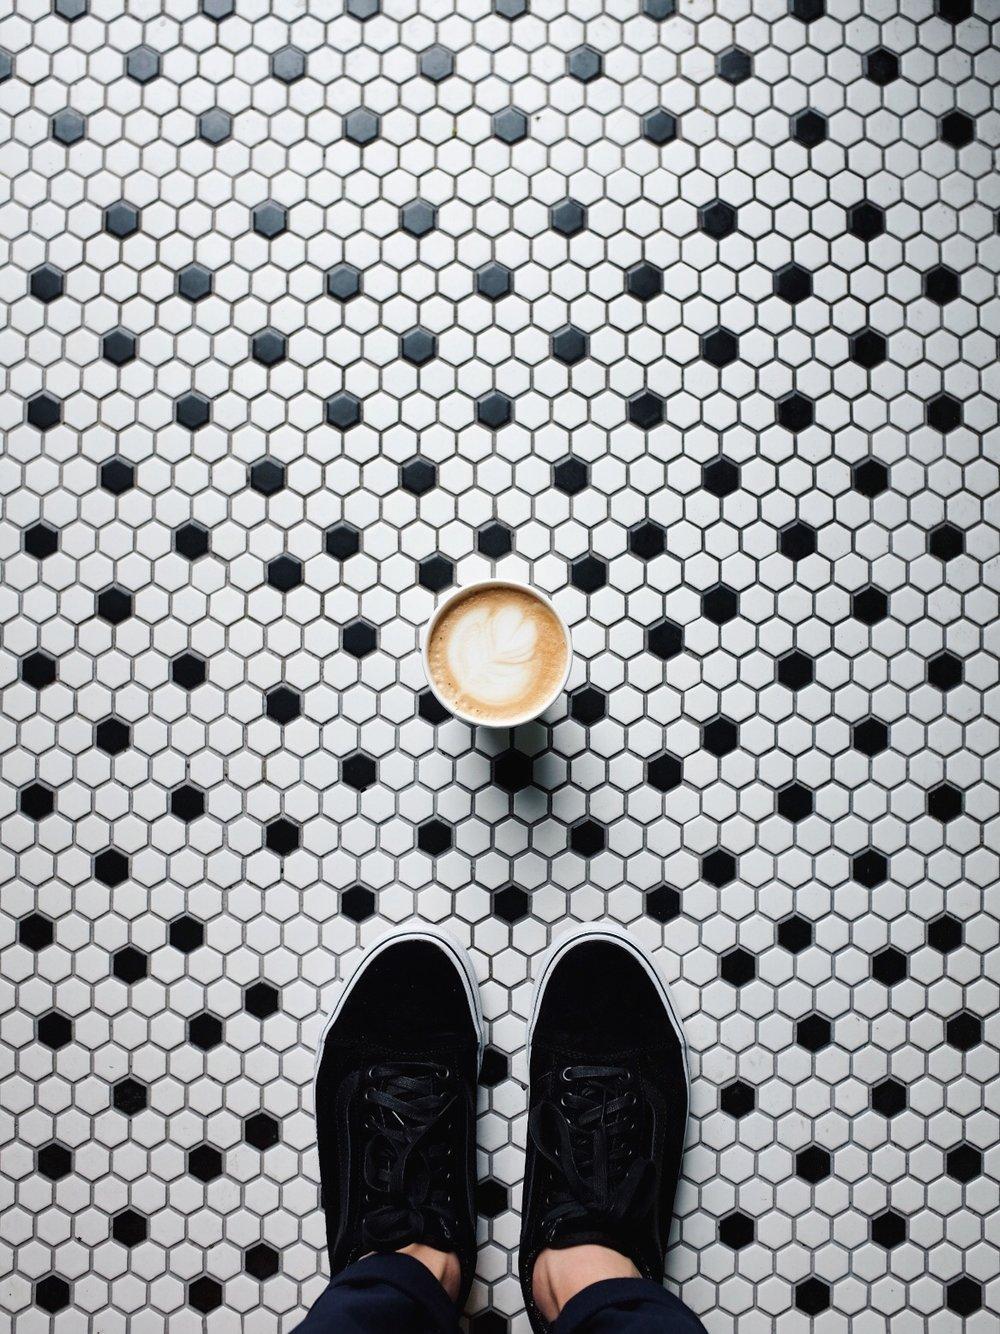 coffee shot on tiles vans